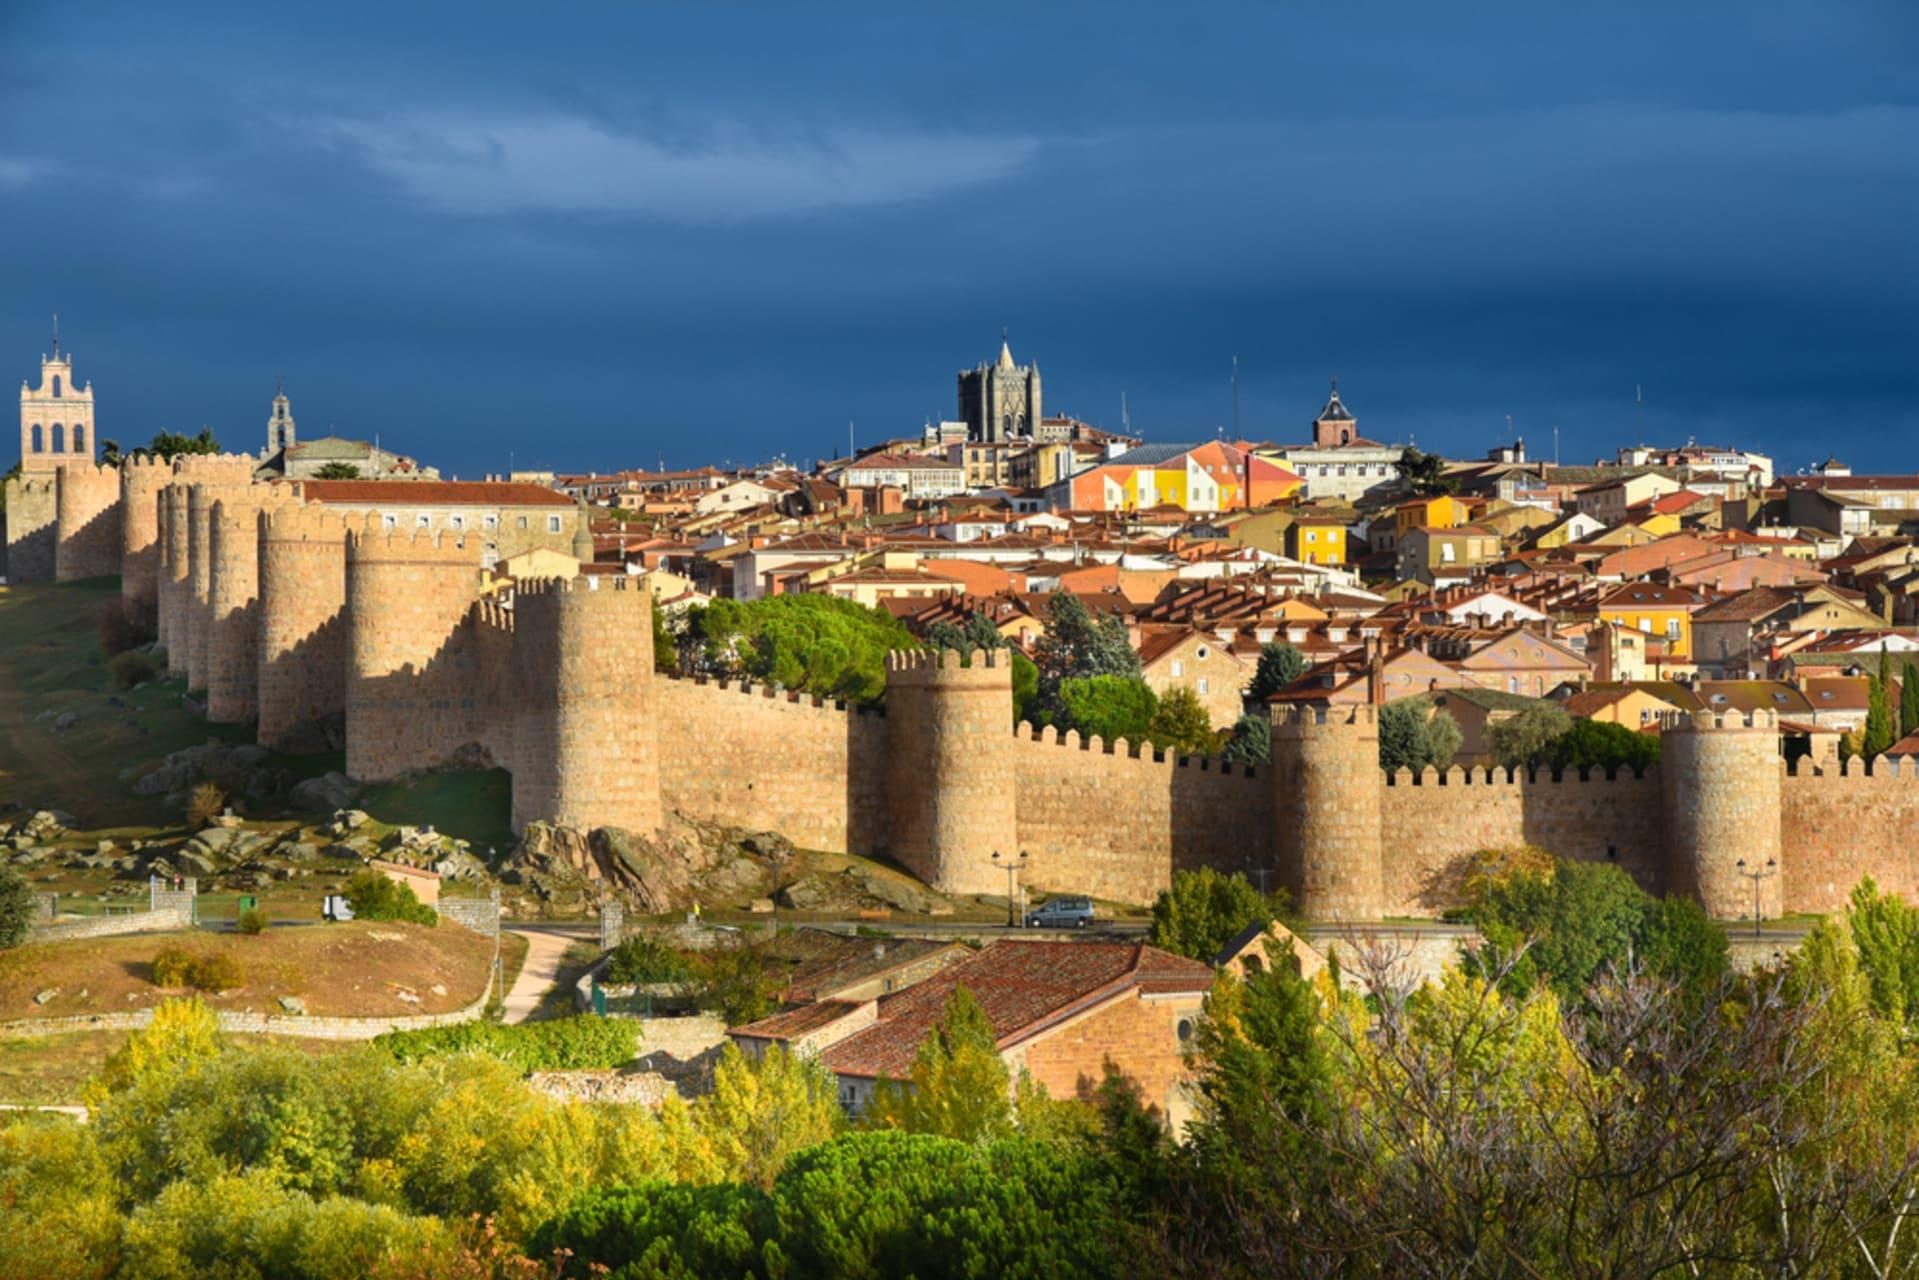 Ávila - Ávila, the historic ancient town of Saint Teresa of Ávila and the unique wall - Part I